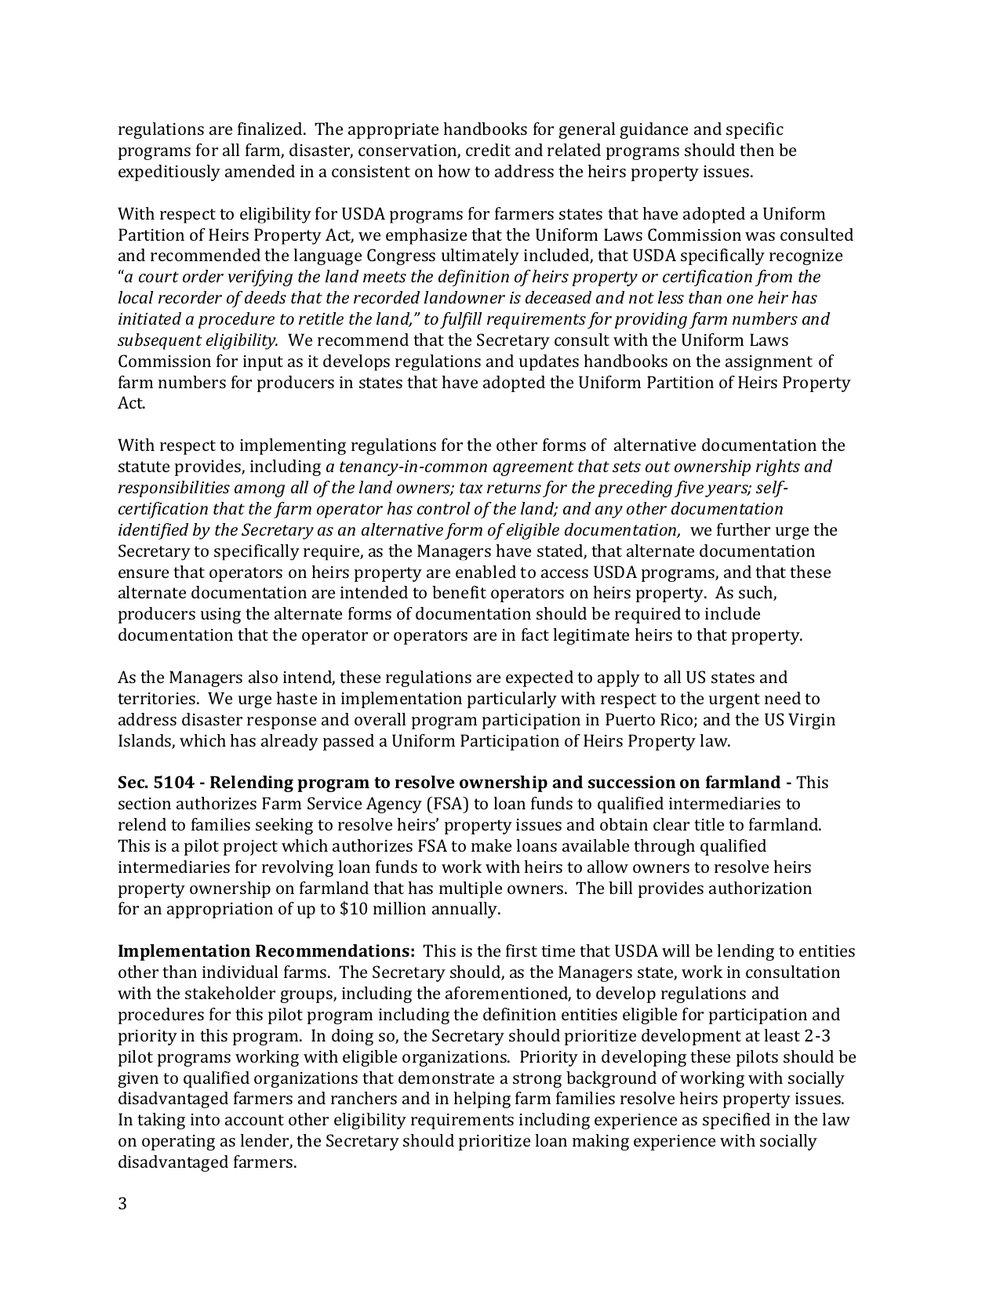 2018 Farm Bill Implementation Recommendations - Rural Co etal final March 1 page 4.jpg